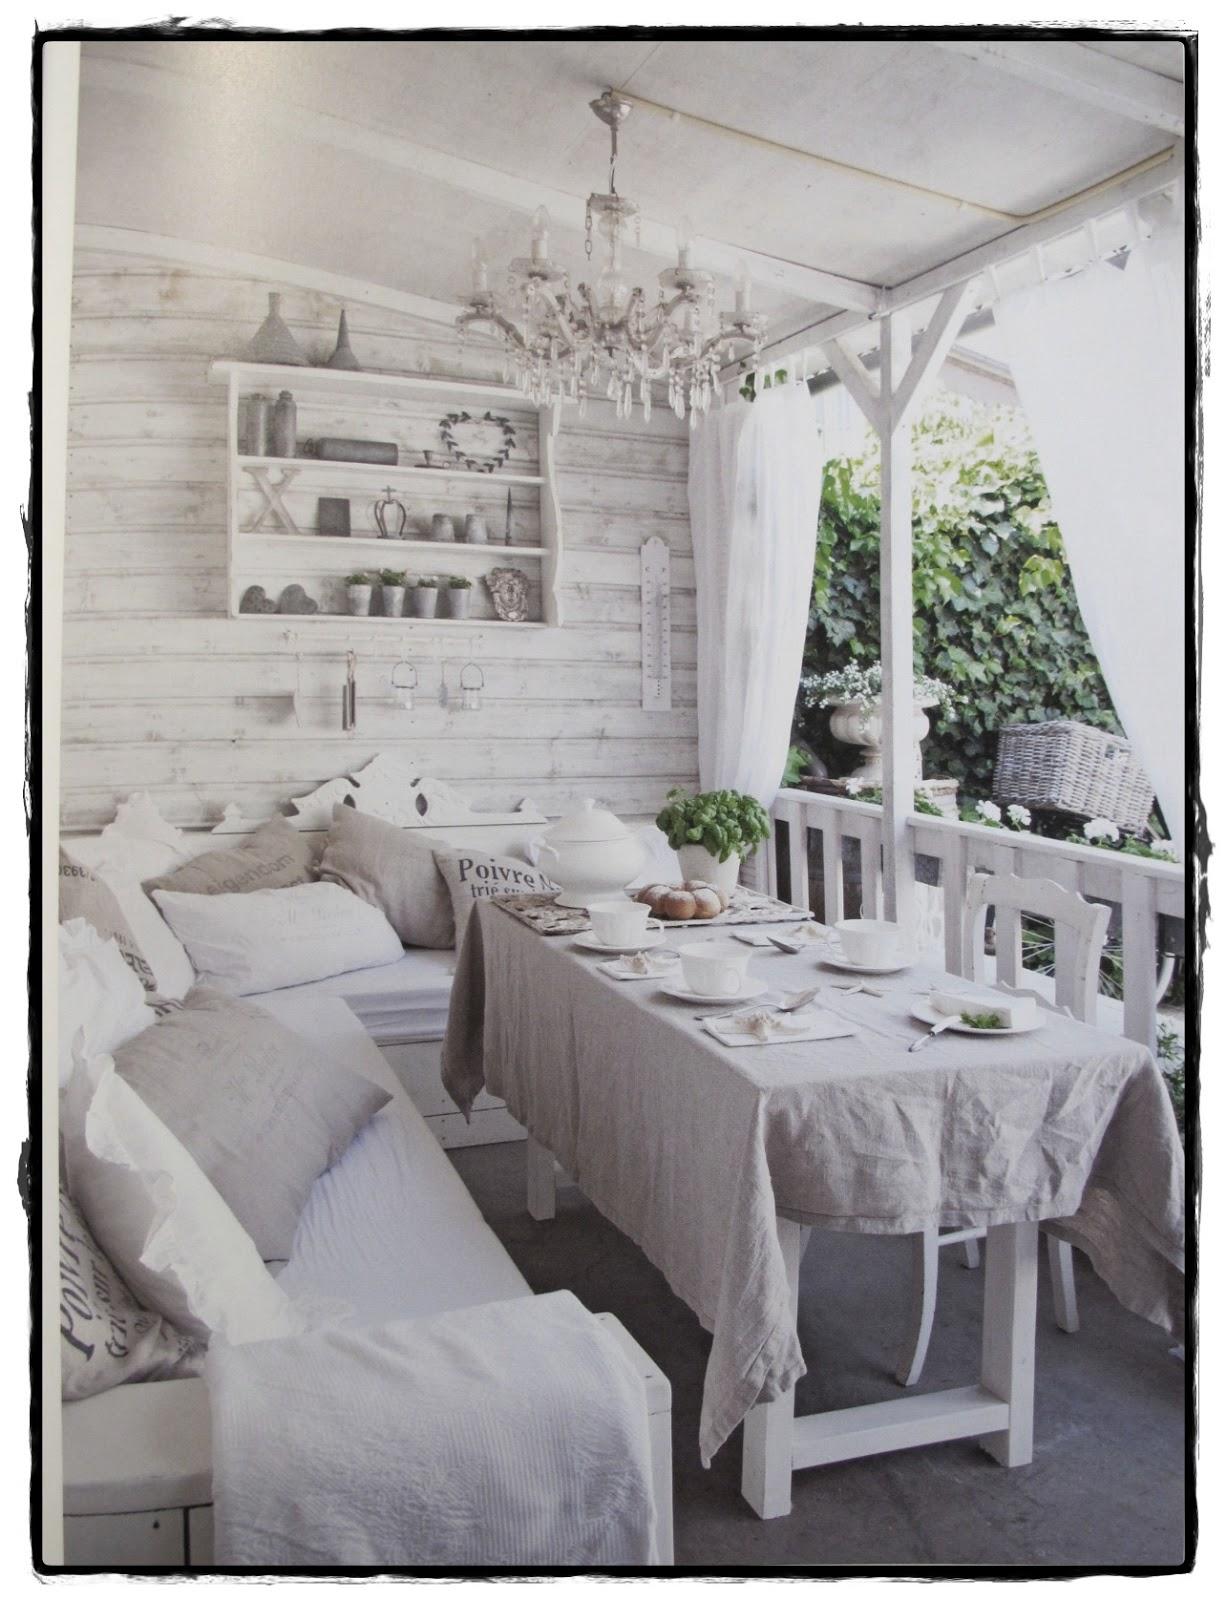 werkstatt ansichtssache kandern jeanne d arc living. Black Bedroom Furniture Sets. Home Design Ideas